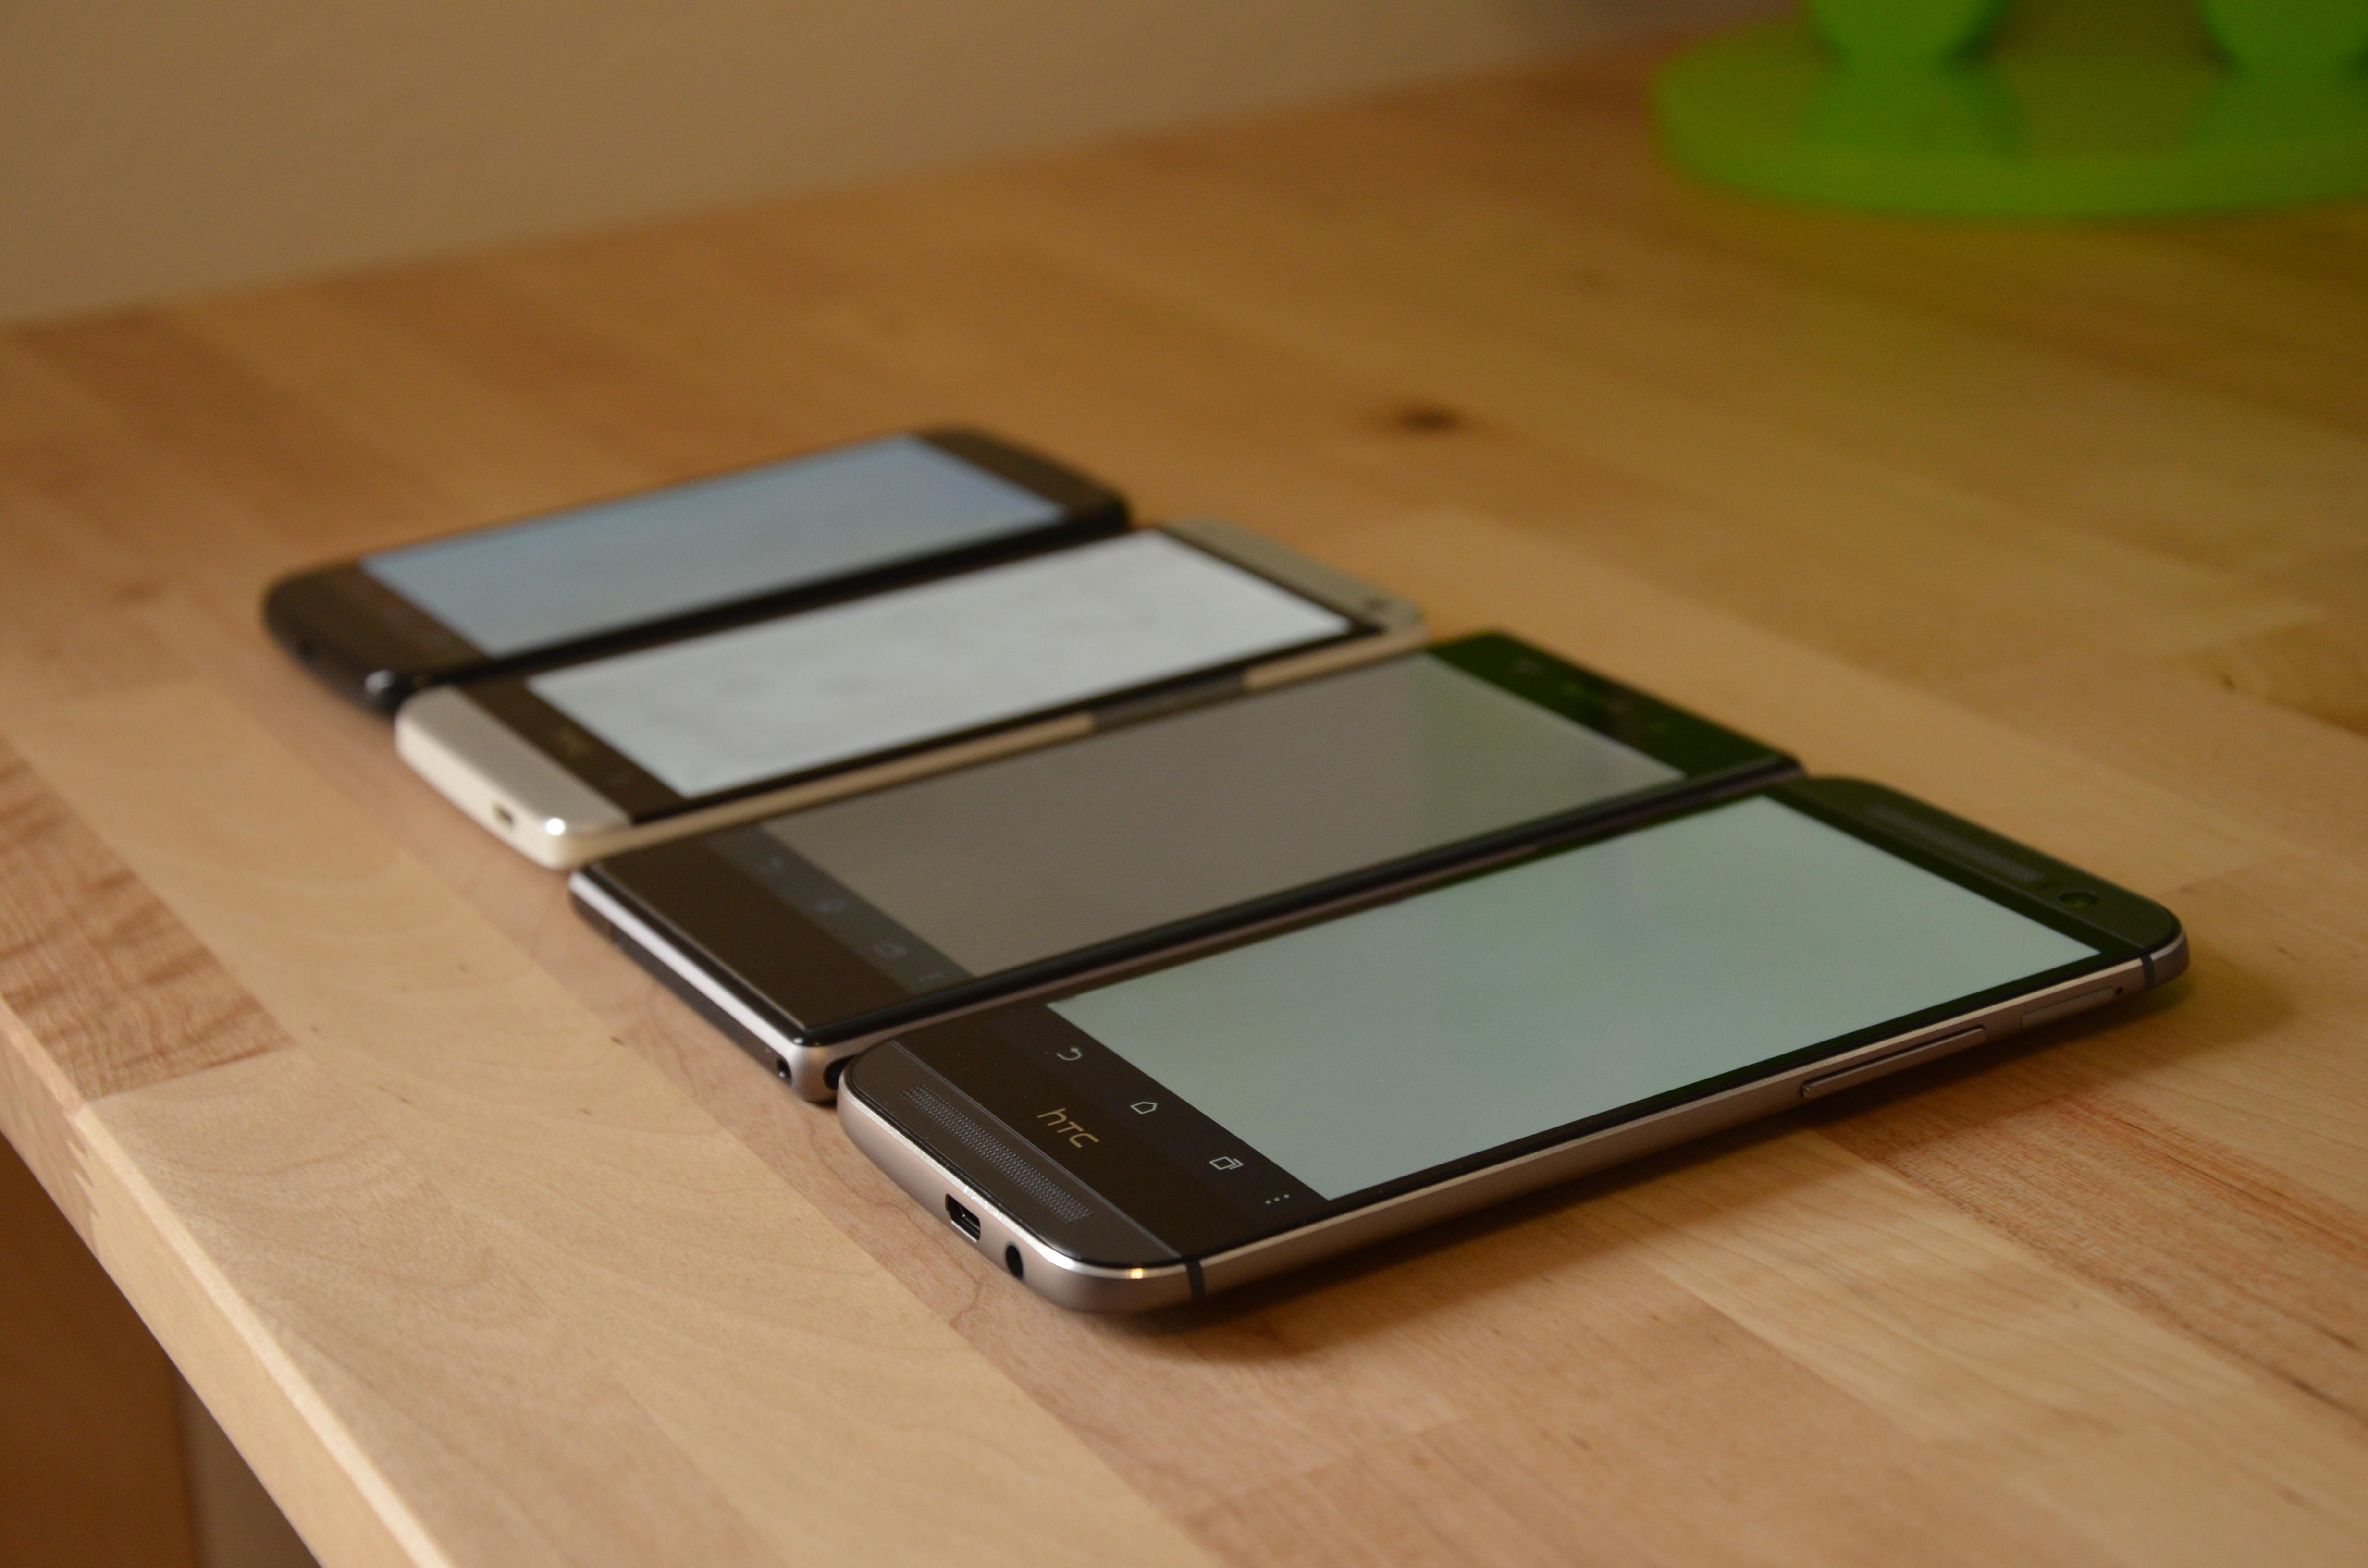 d2e65a95cf9b0b Test HTC One (M8)   notre avis complet - Smartphones - FrAndroid